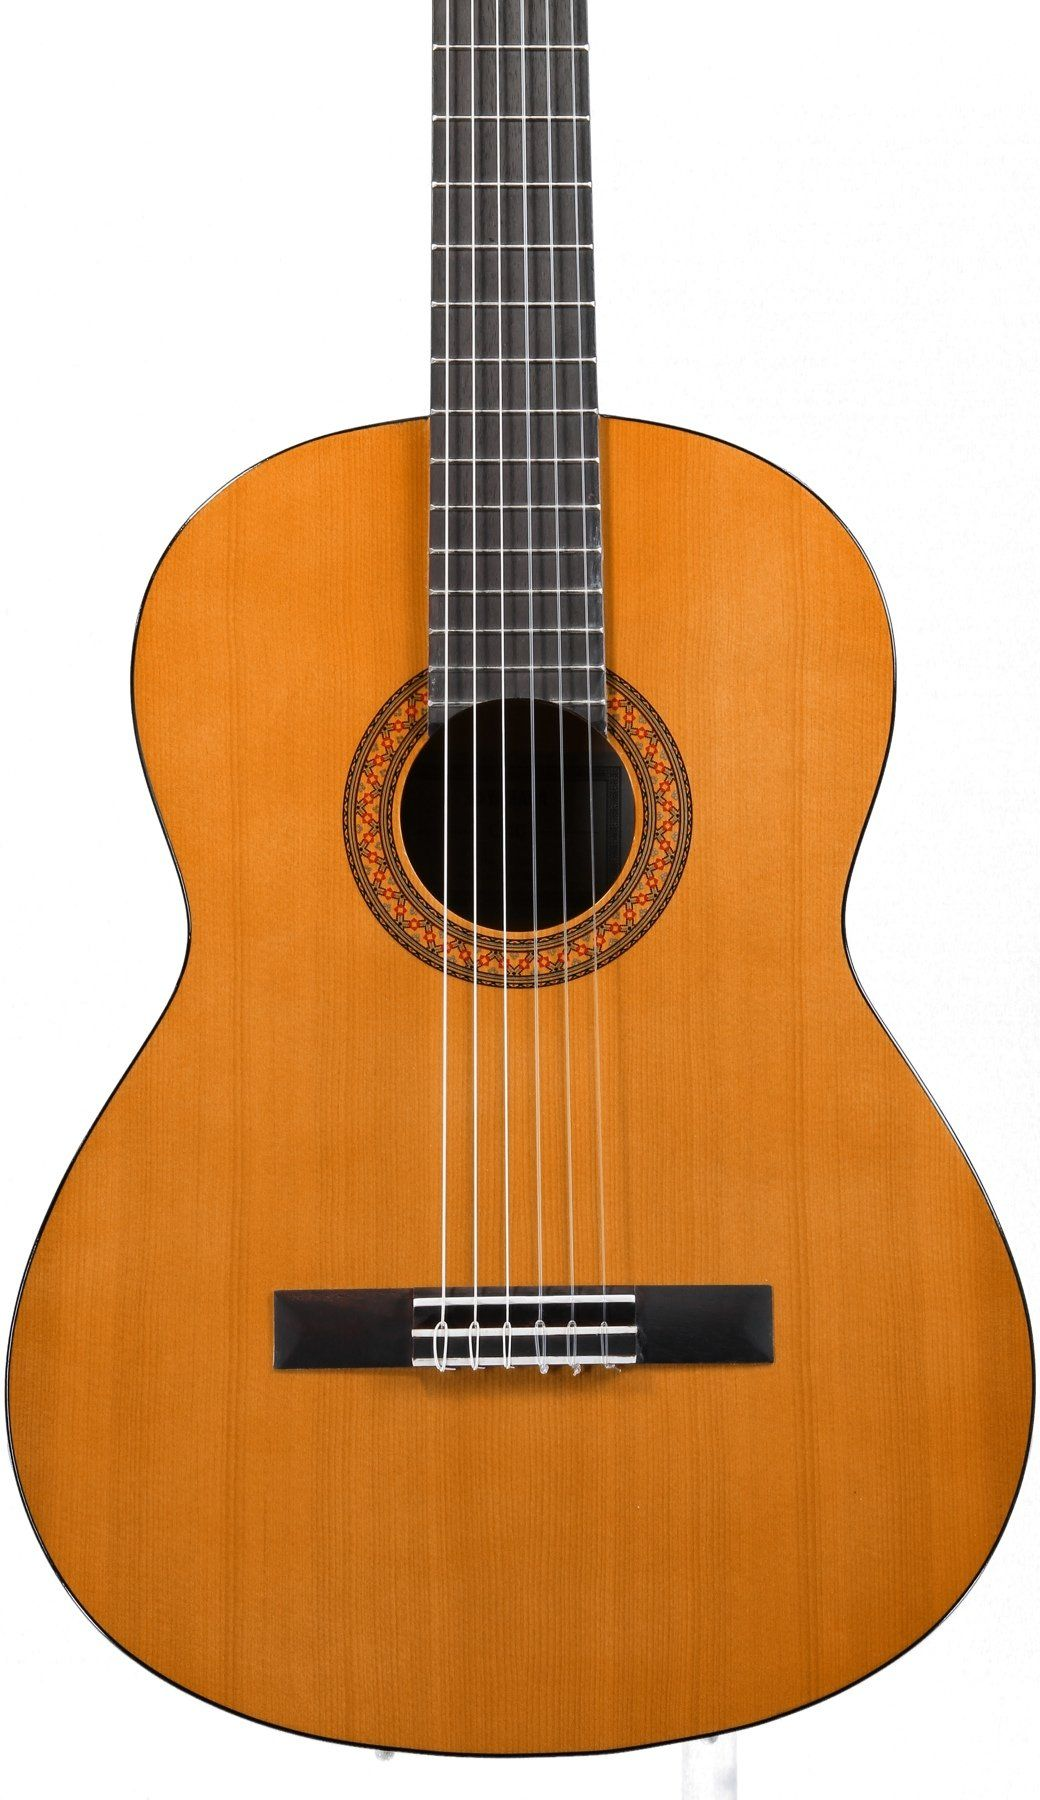 Yamaha C40ii Full Scale Classical Natural Sweetwater Yamaha C40 Guitar Yamaha